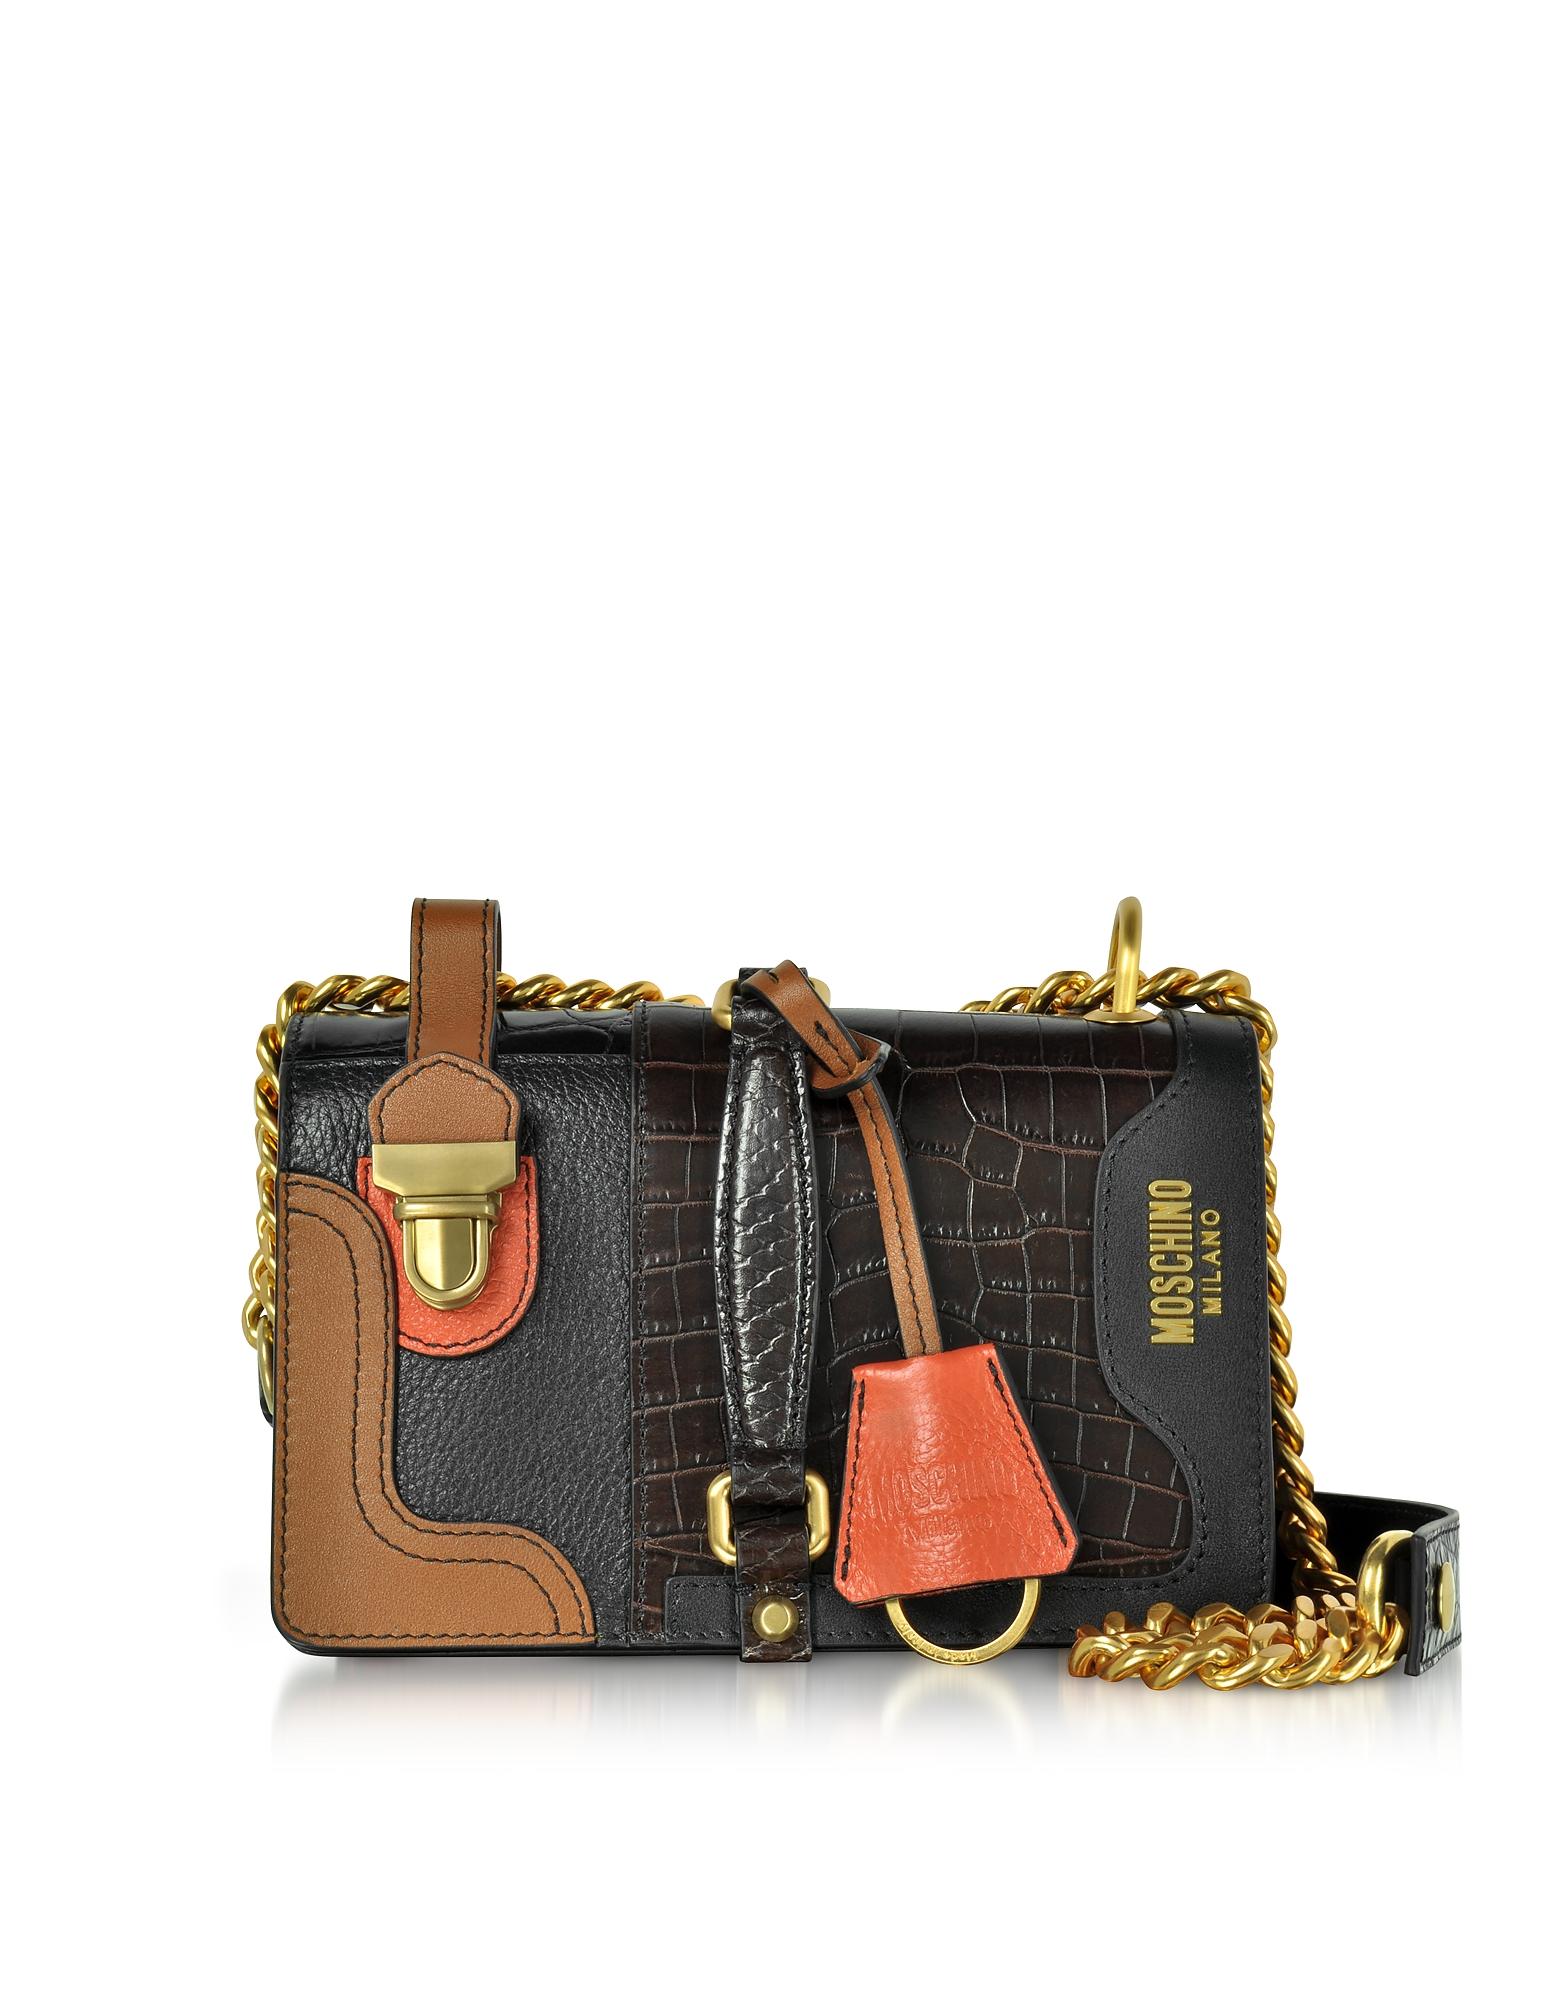 Moschino Handbags, Brown Embossed Croco Leather Shoulder Bag